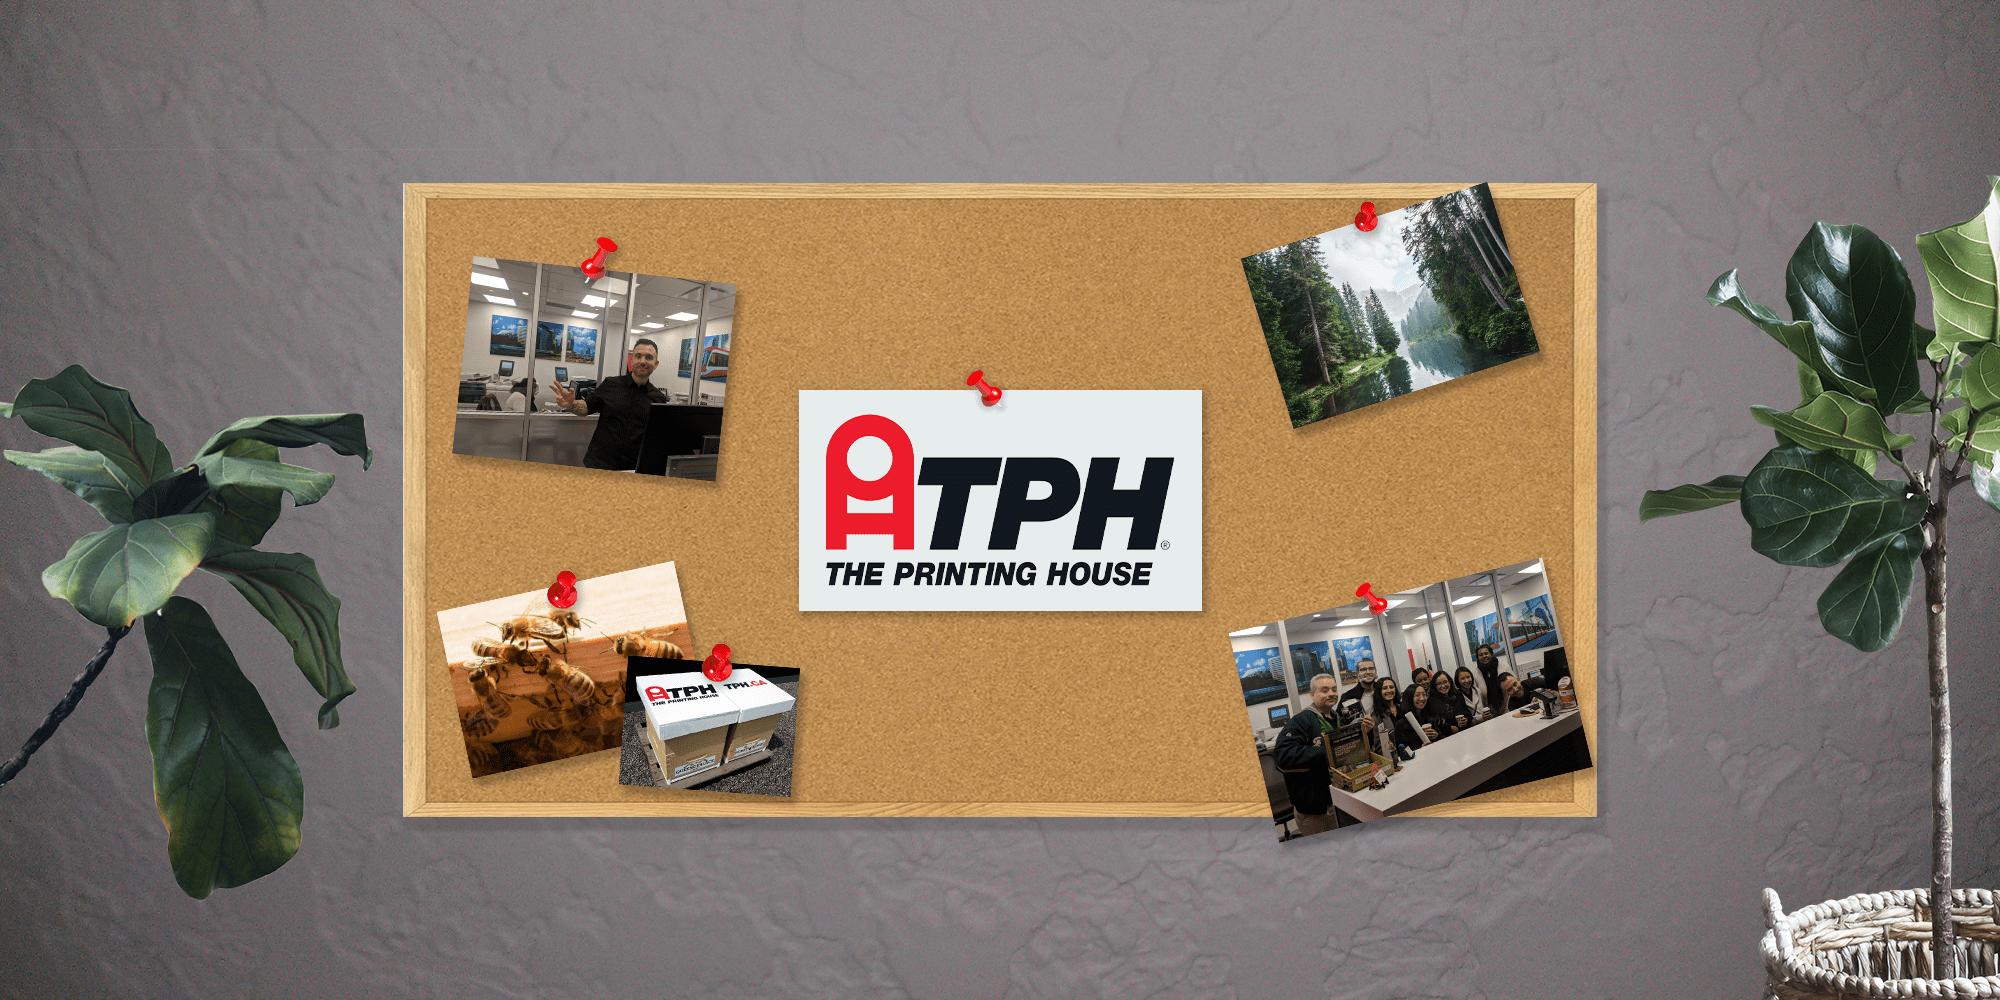 PDT meets TPH